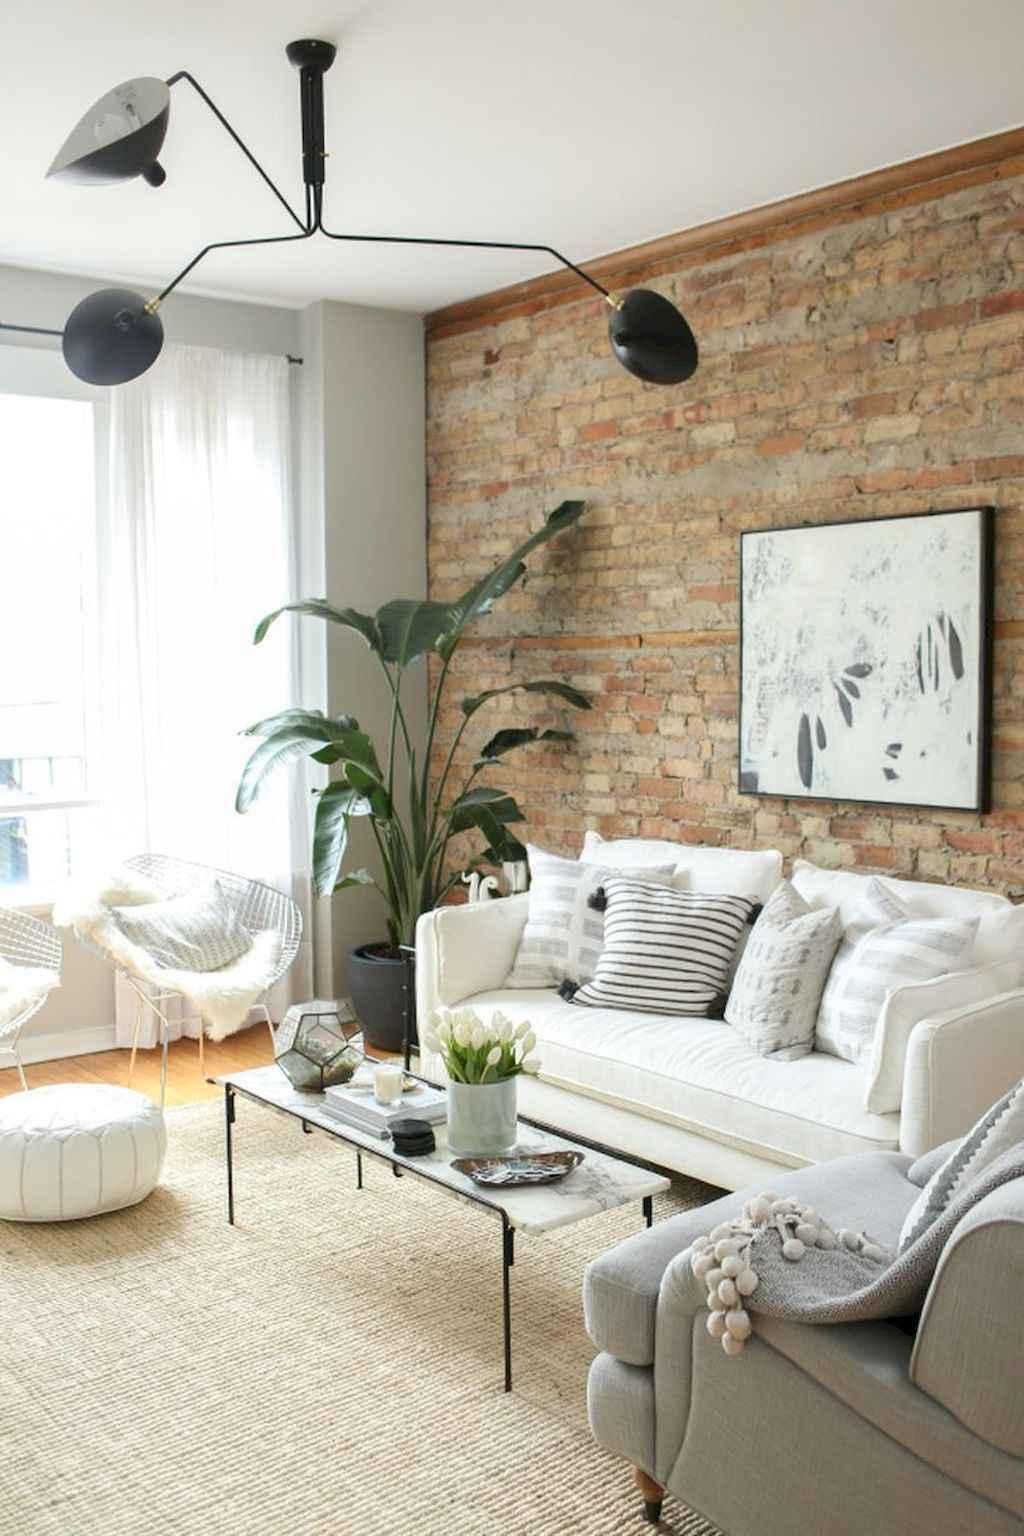 70 Rustic Farmhouse Living Room Decor Ideas (54)